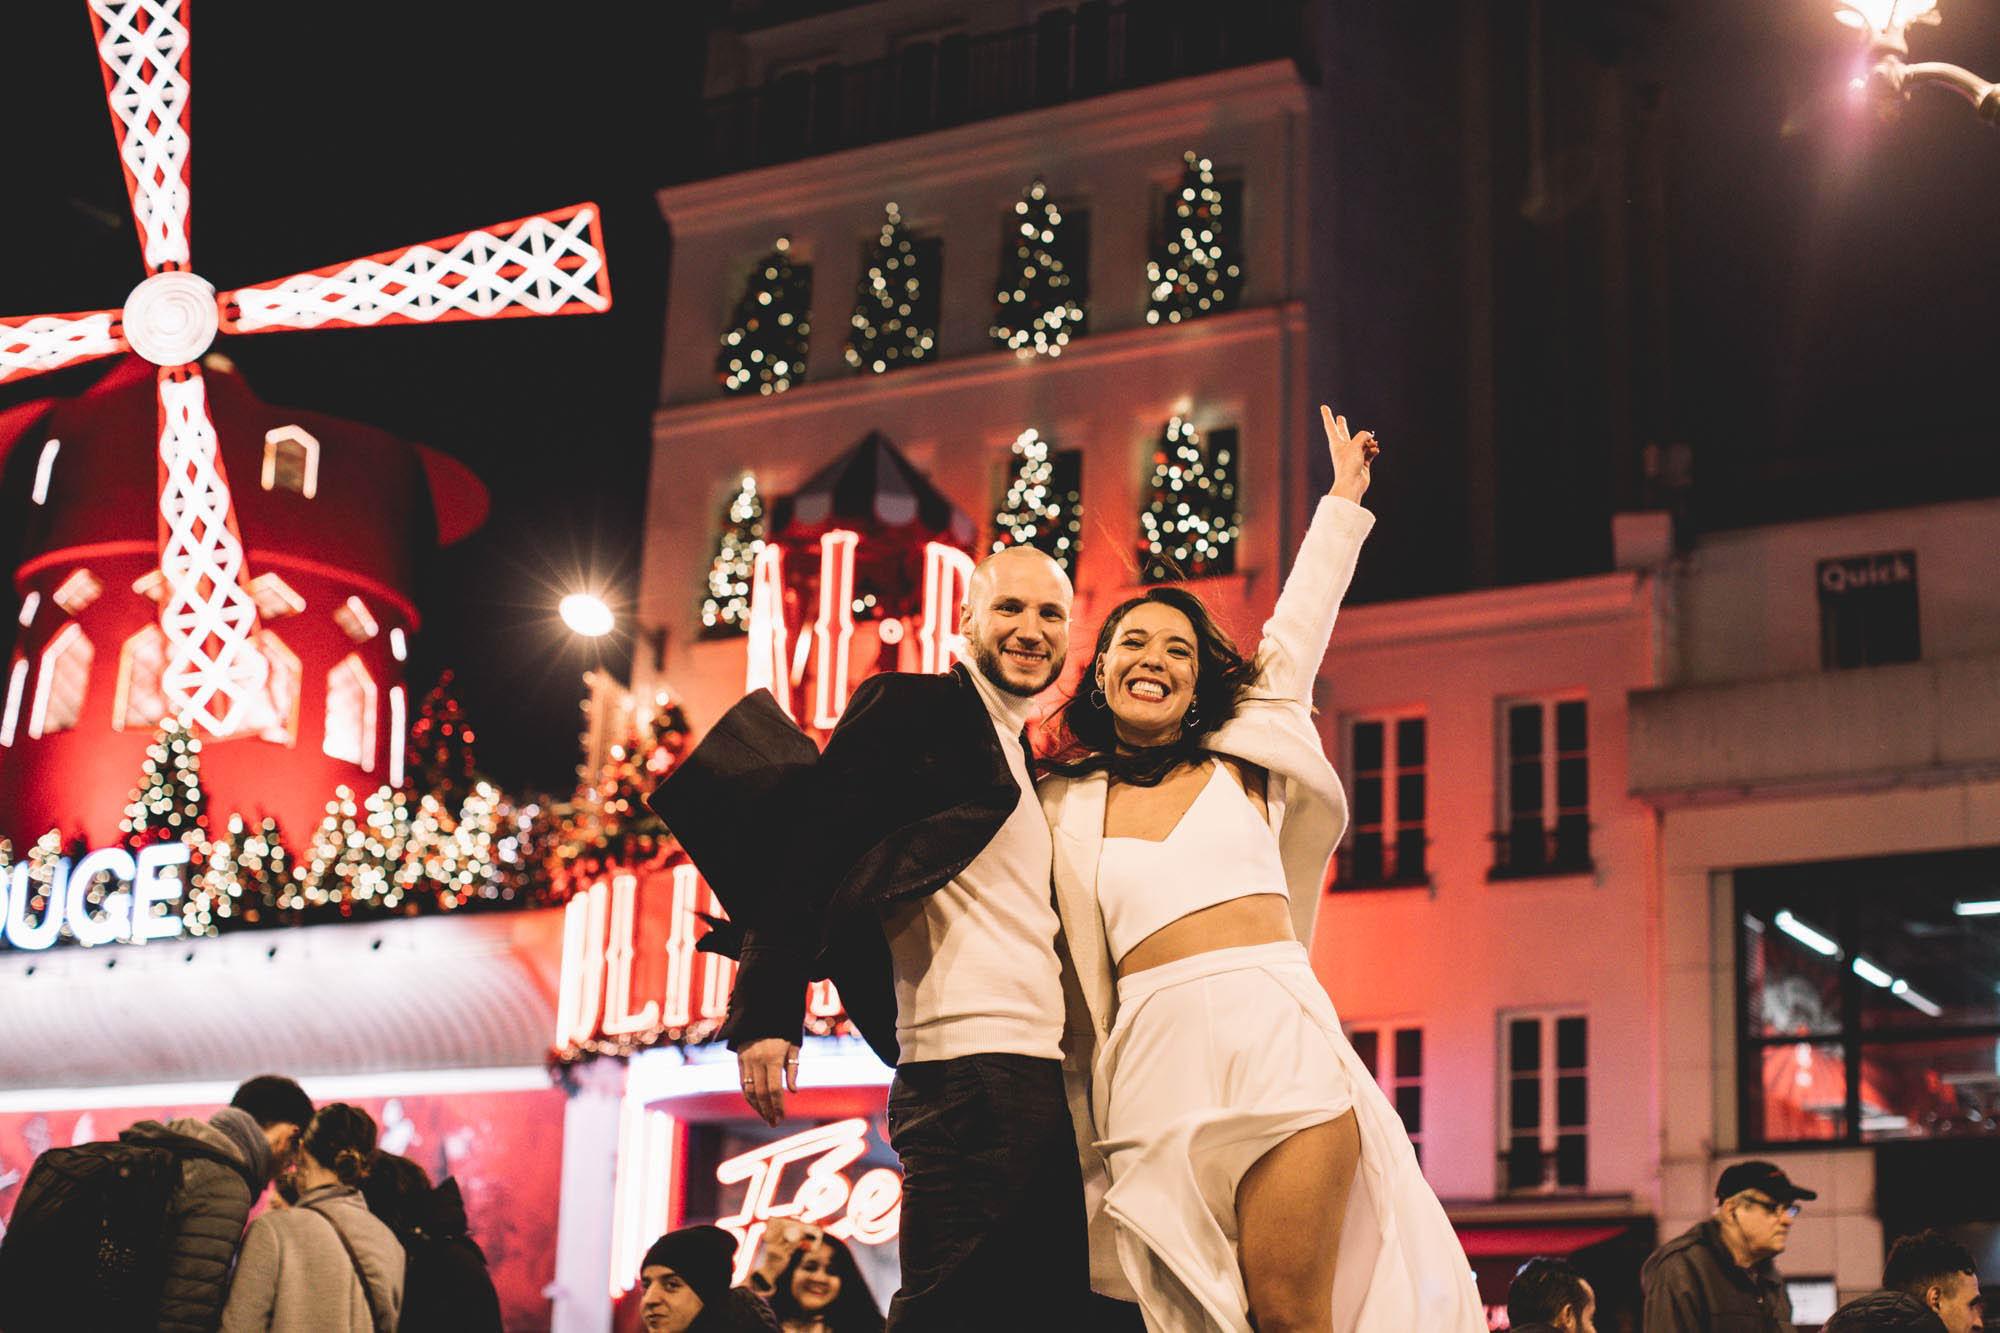 MIMI + JON_PIGALLE HOTEL_PARIS_PHOTOGRAPHE_MARIAGE_LES BANDITS-6